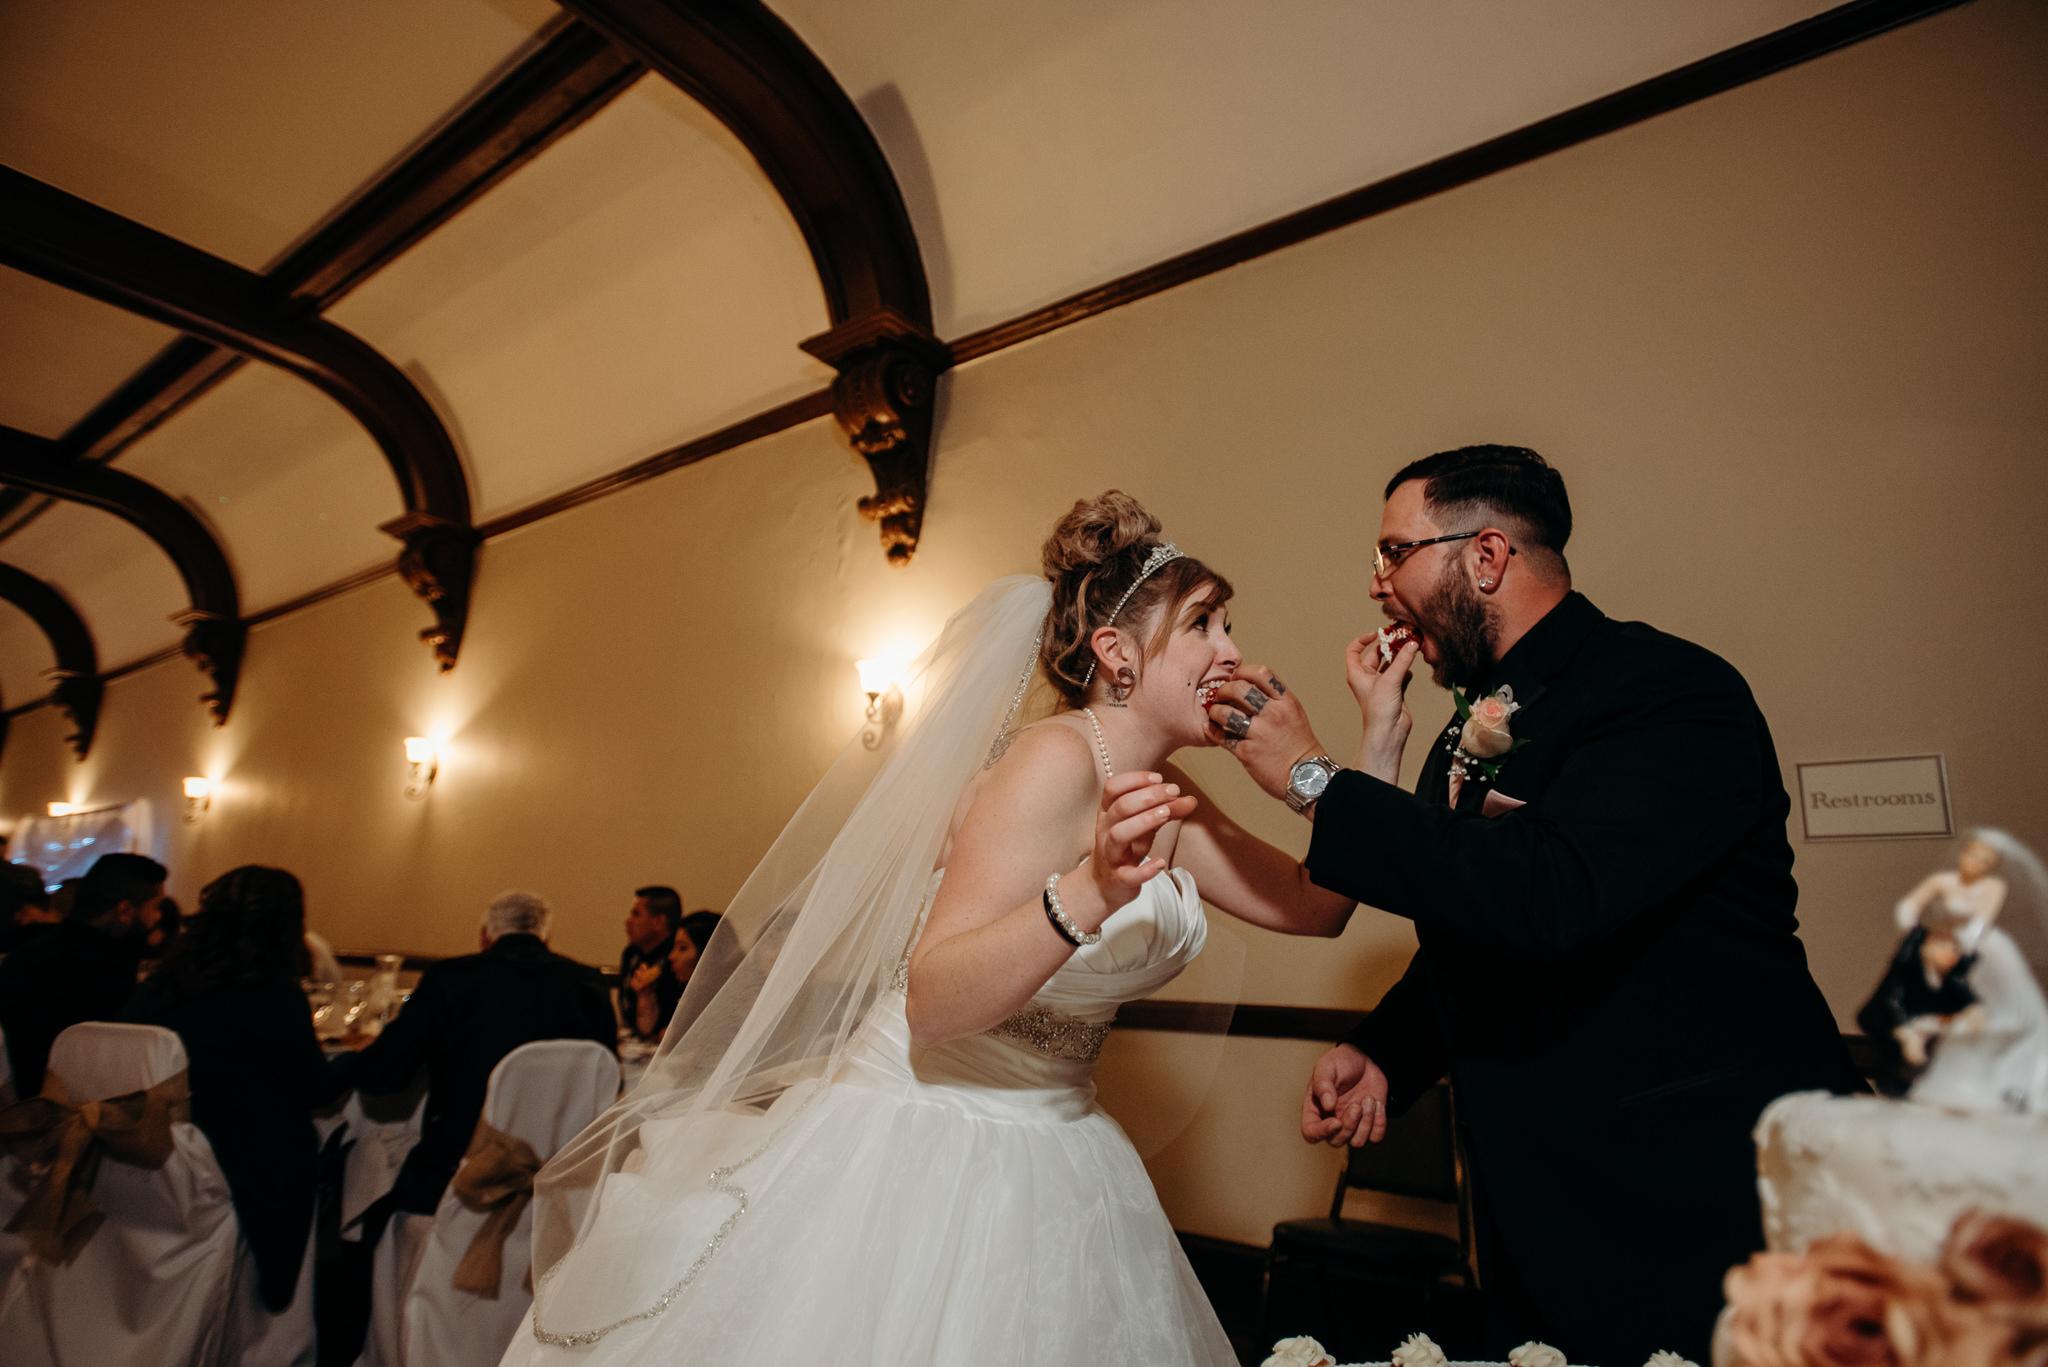 Grant Beachy Photo portrait wedding goshen elkhart south bend chicago-044.jpg